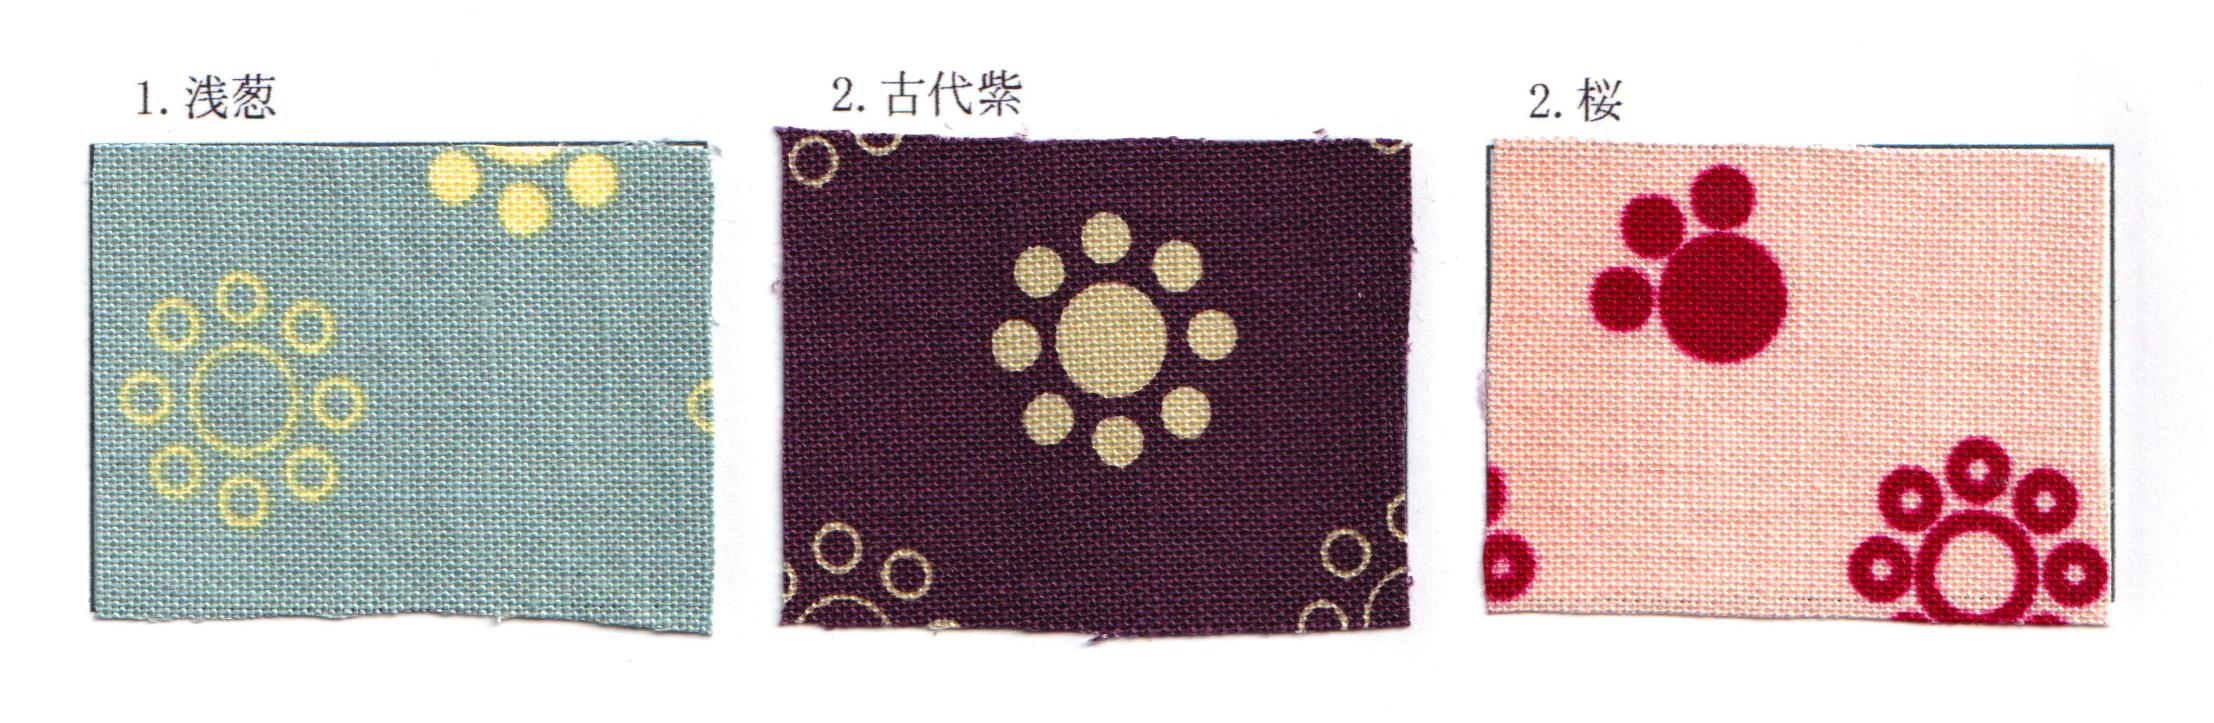 http://www.kyoto-platz.jp/news/images/%E4%B9%9D%E6%9B%9C%E7%B5%9Epsd.jpg